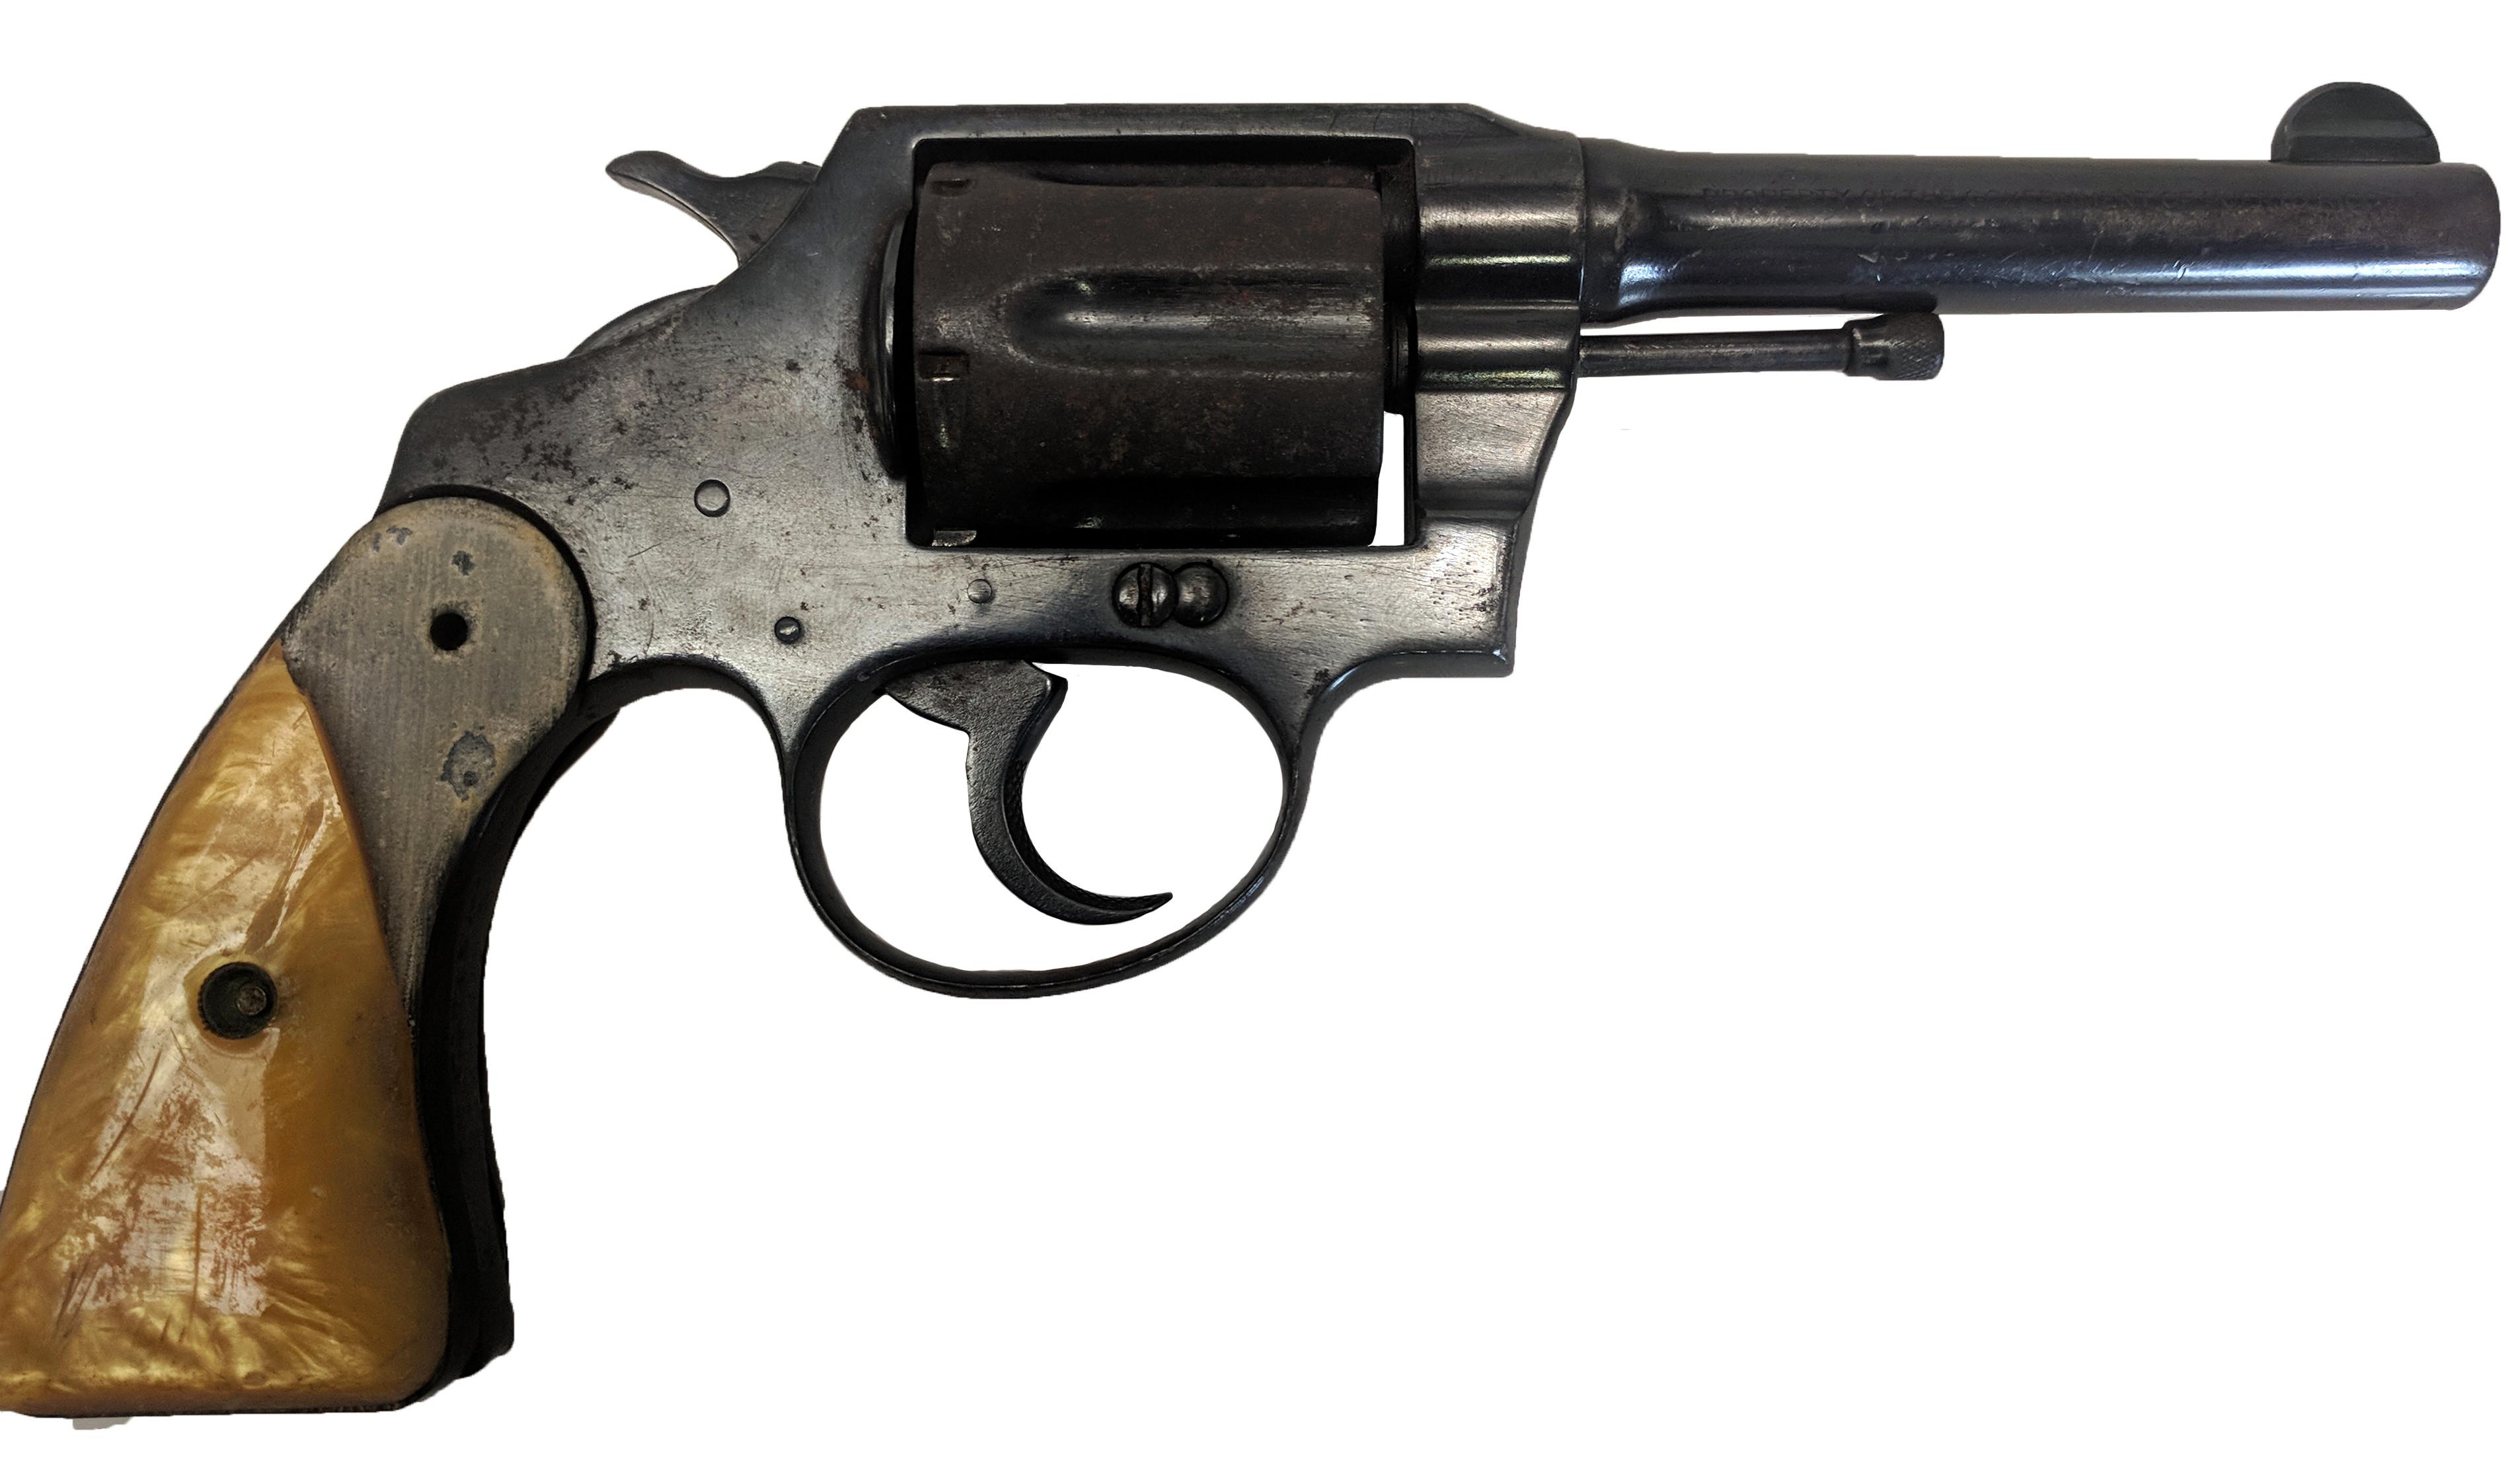 "Colt Police Positive, .38 Special, 4"" Barrel, Fixed Sights, Blued, *Poor, Incomplete*"